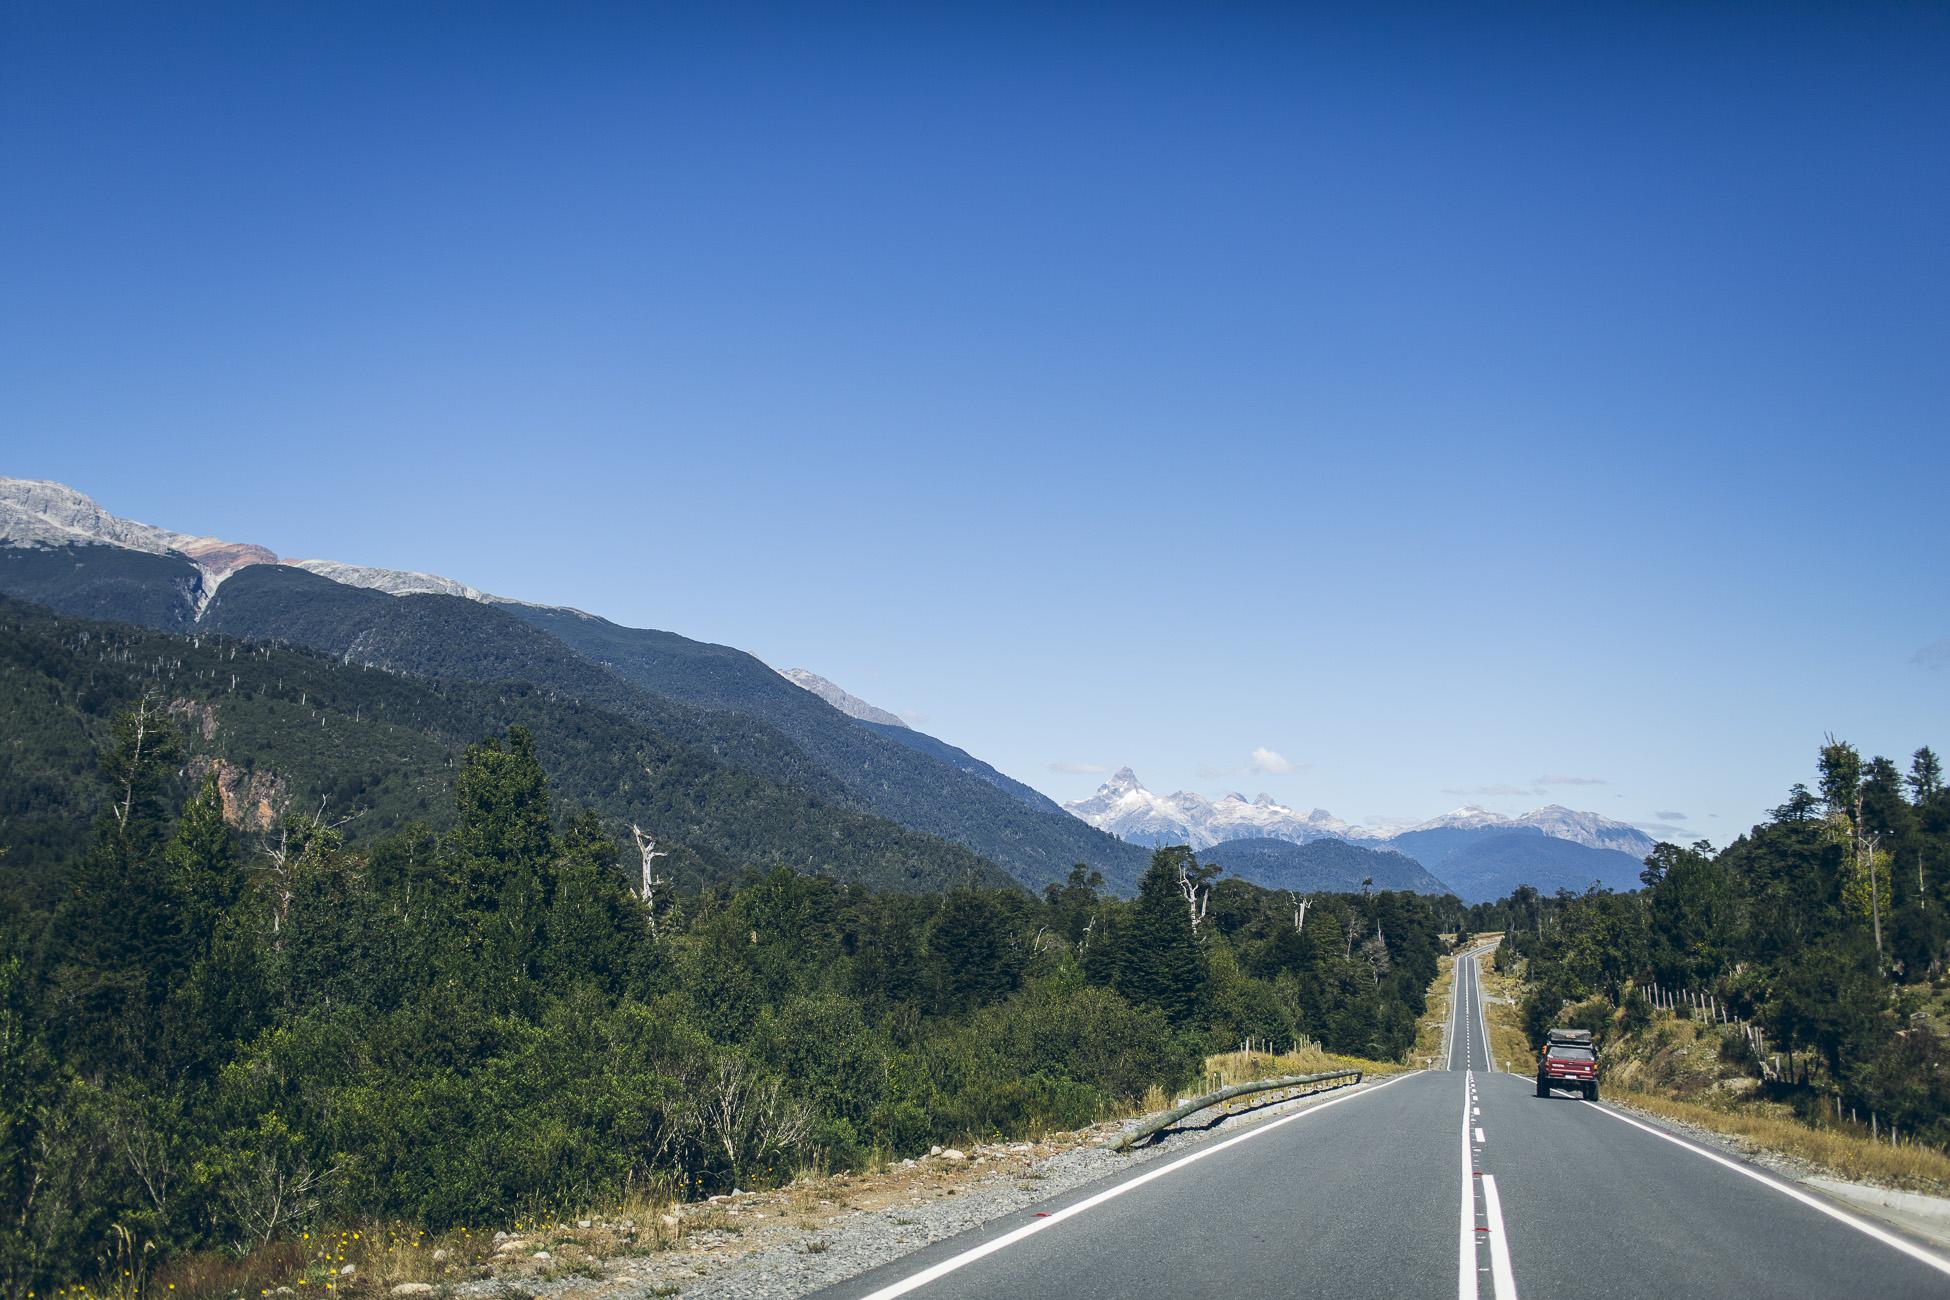 desktoglory_carretera_austral-39